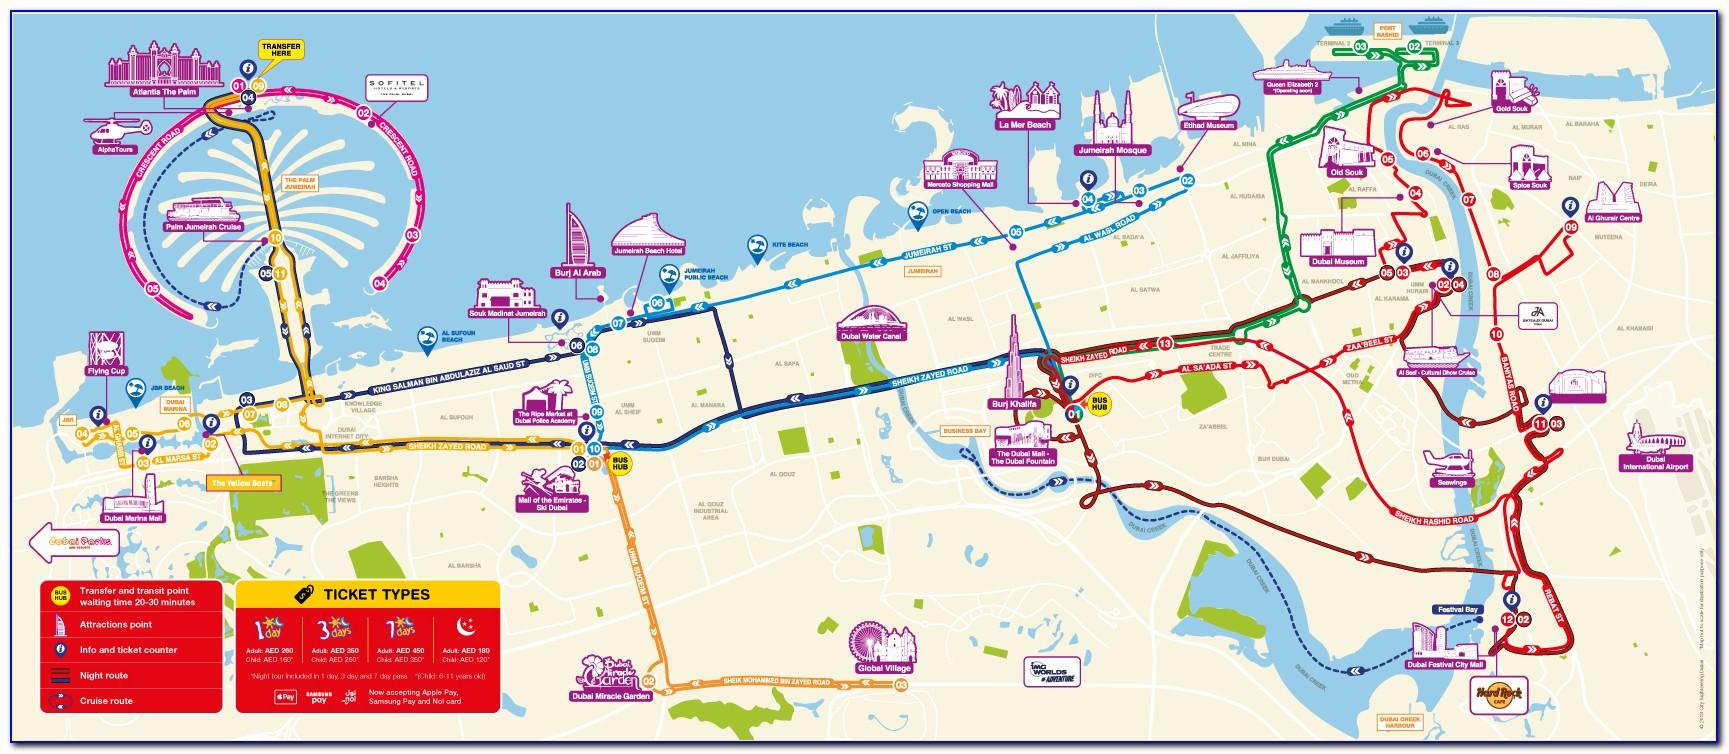 Dubai City Sightseeing Bus Map